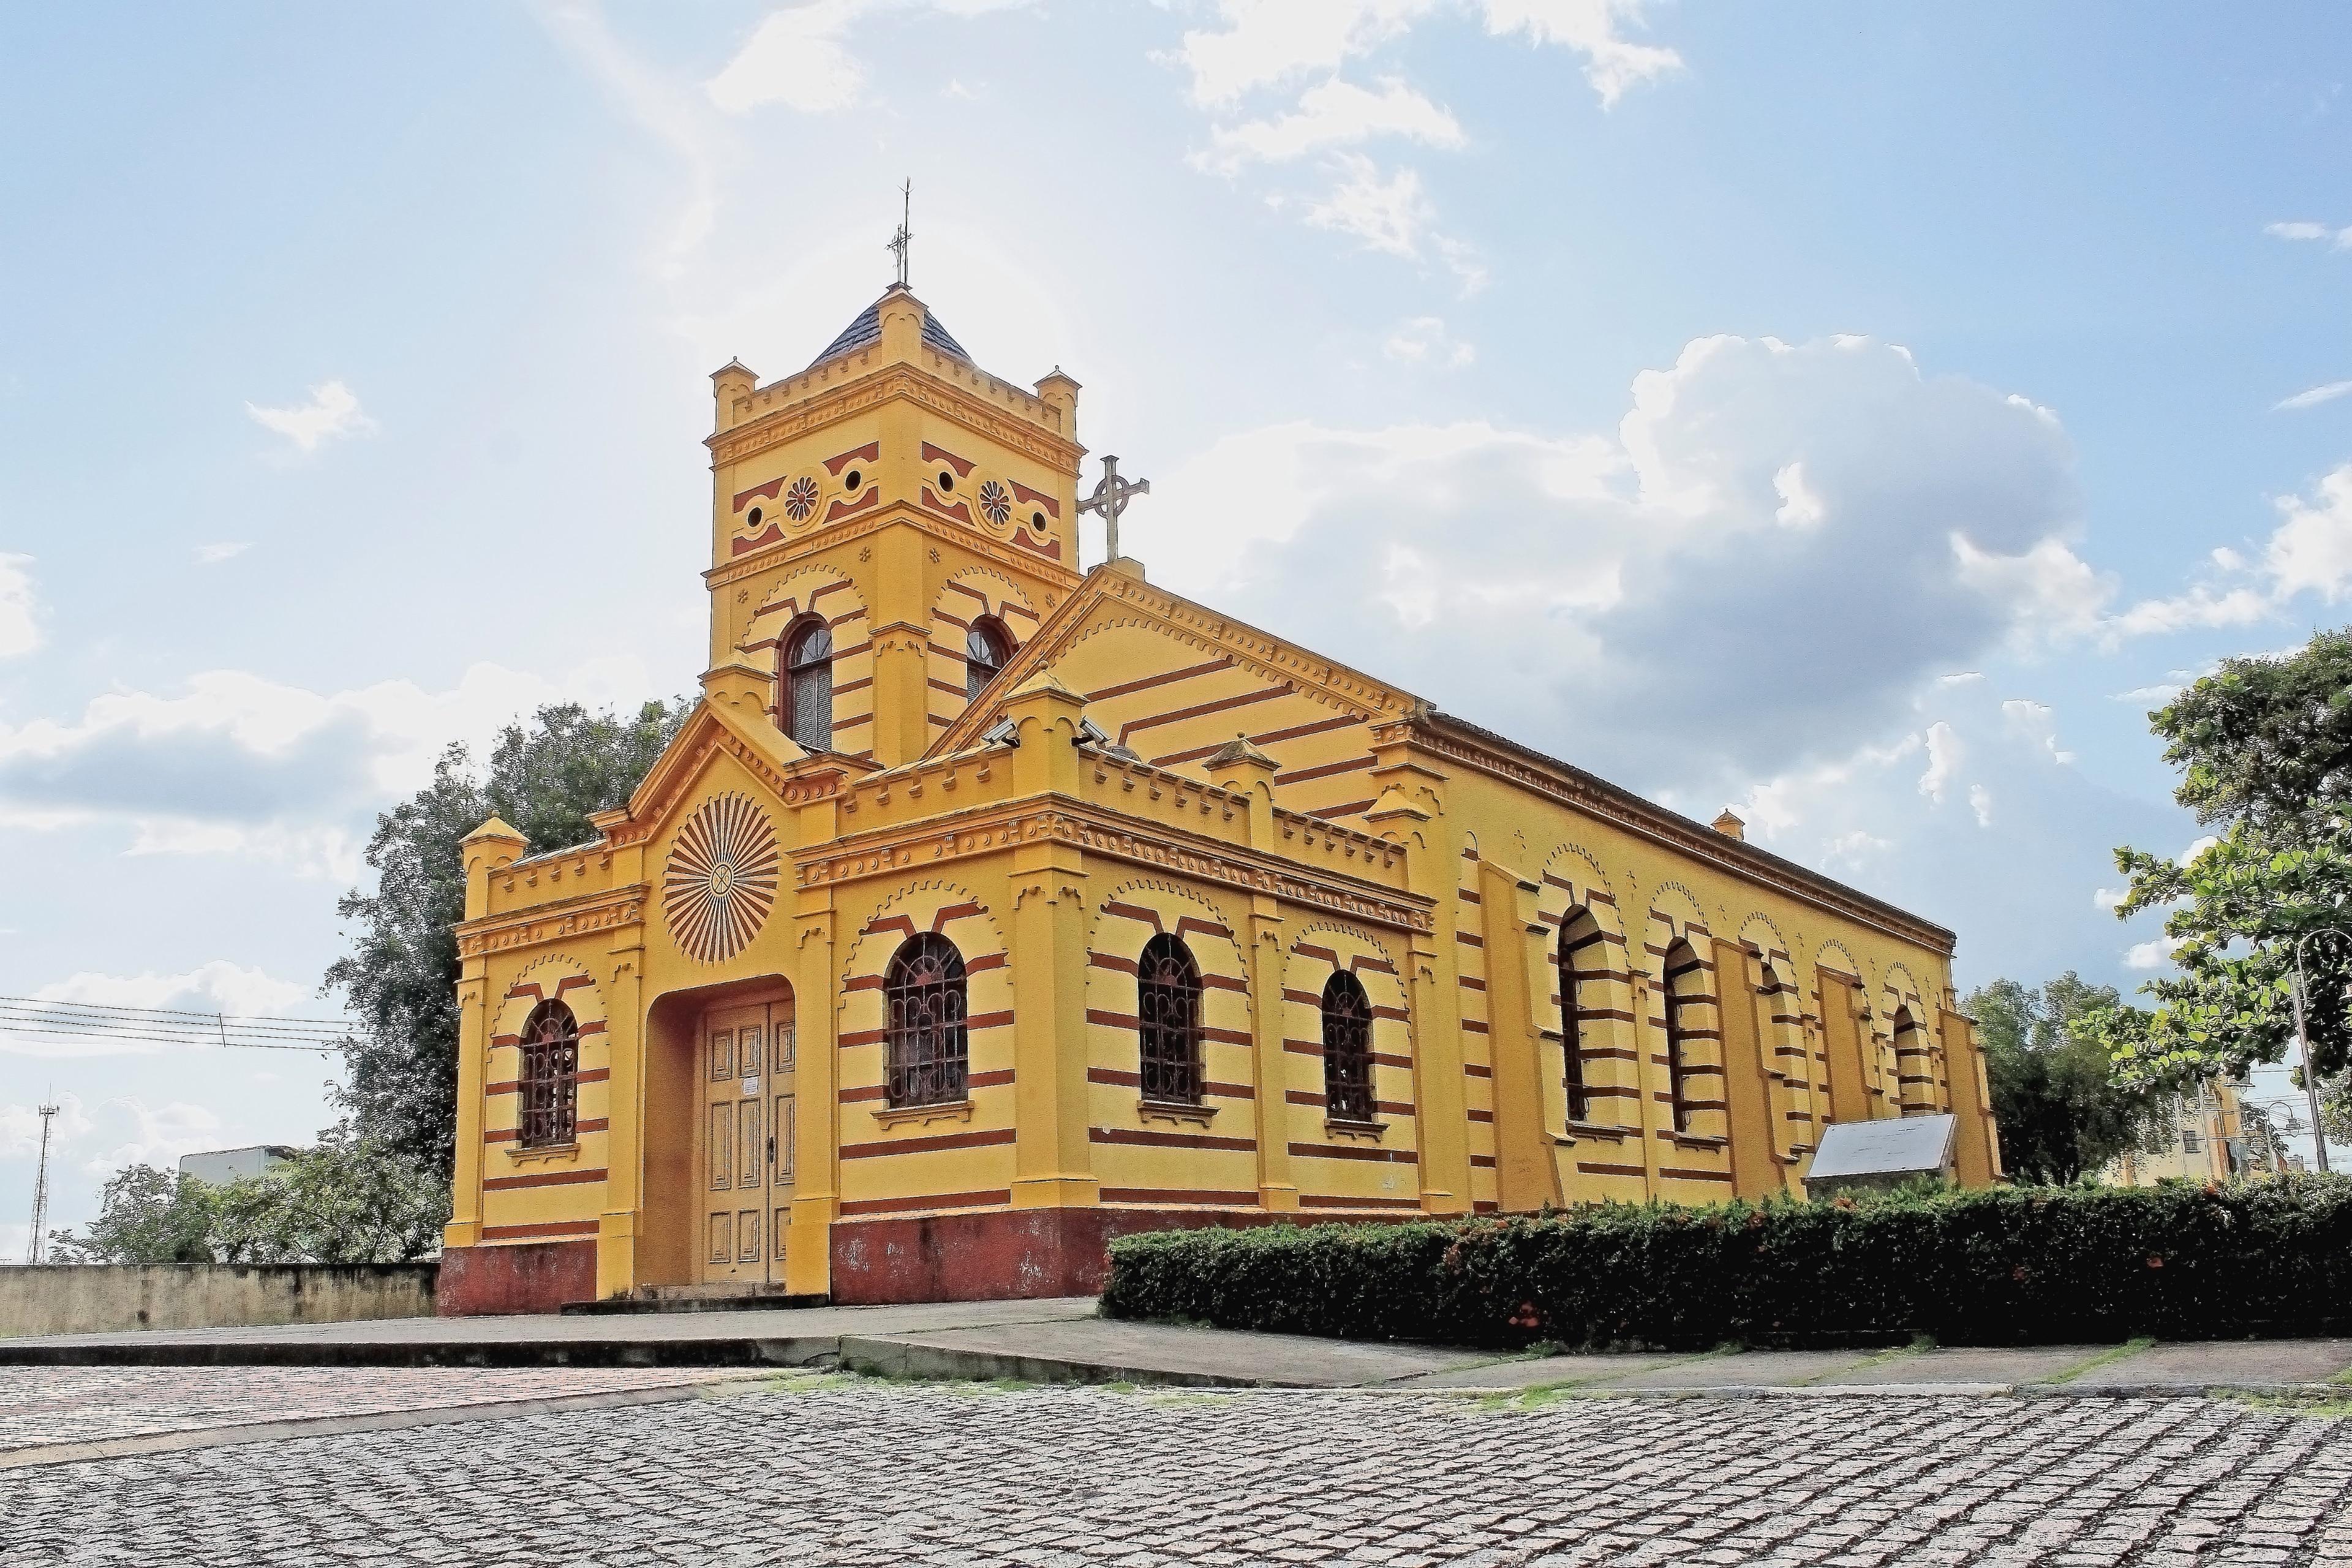 Boa Vista, Recife, Bundesstaat Pernambuco, Brasilien